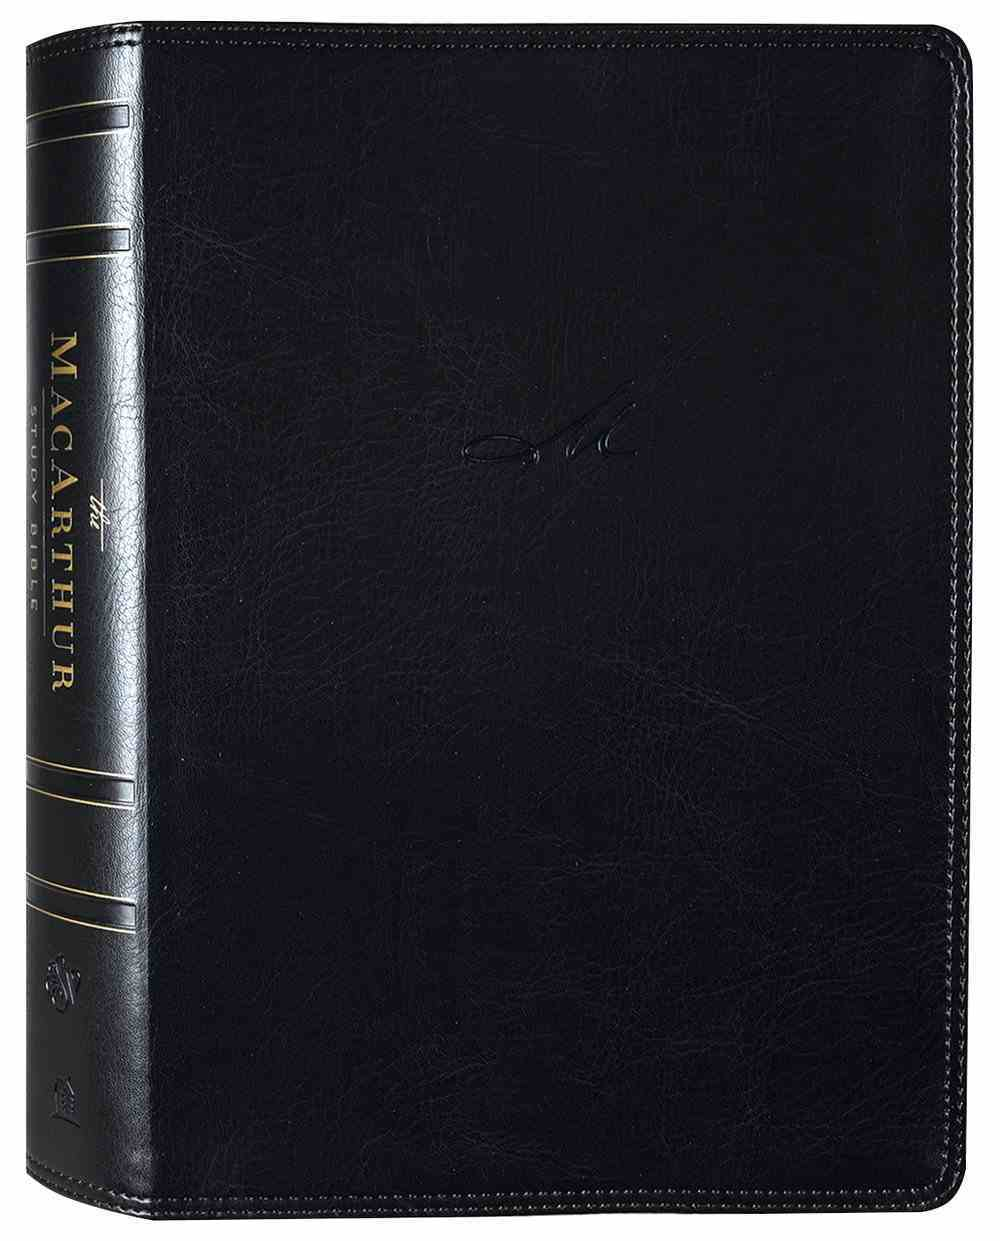 ESV Macarthur Study Bible 2nd Edition Black (Black Letter Edition) Premium Imitation Leather